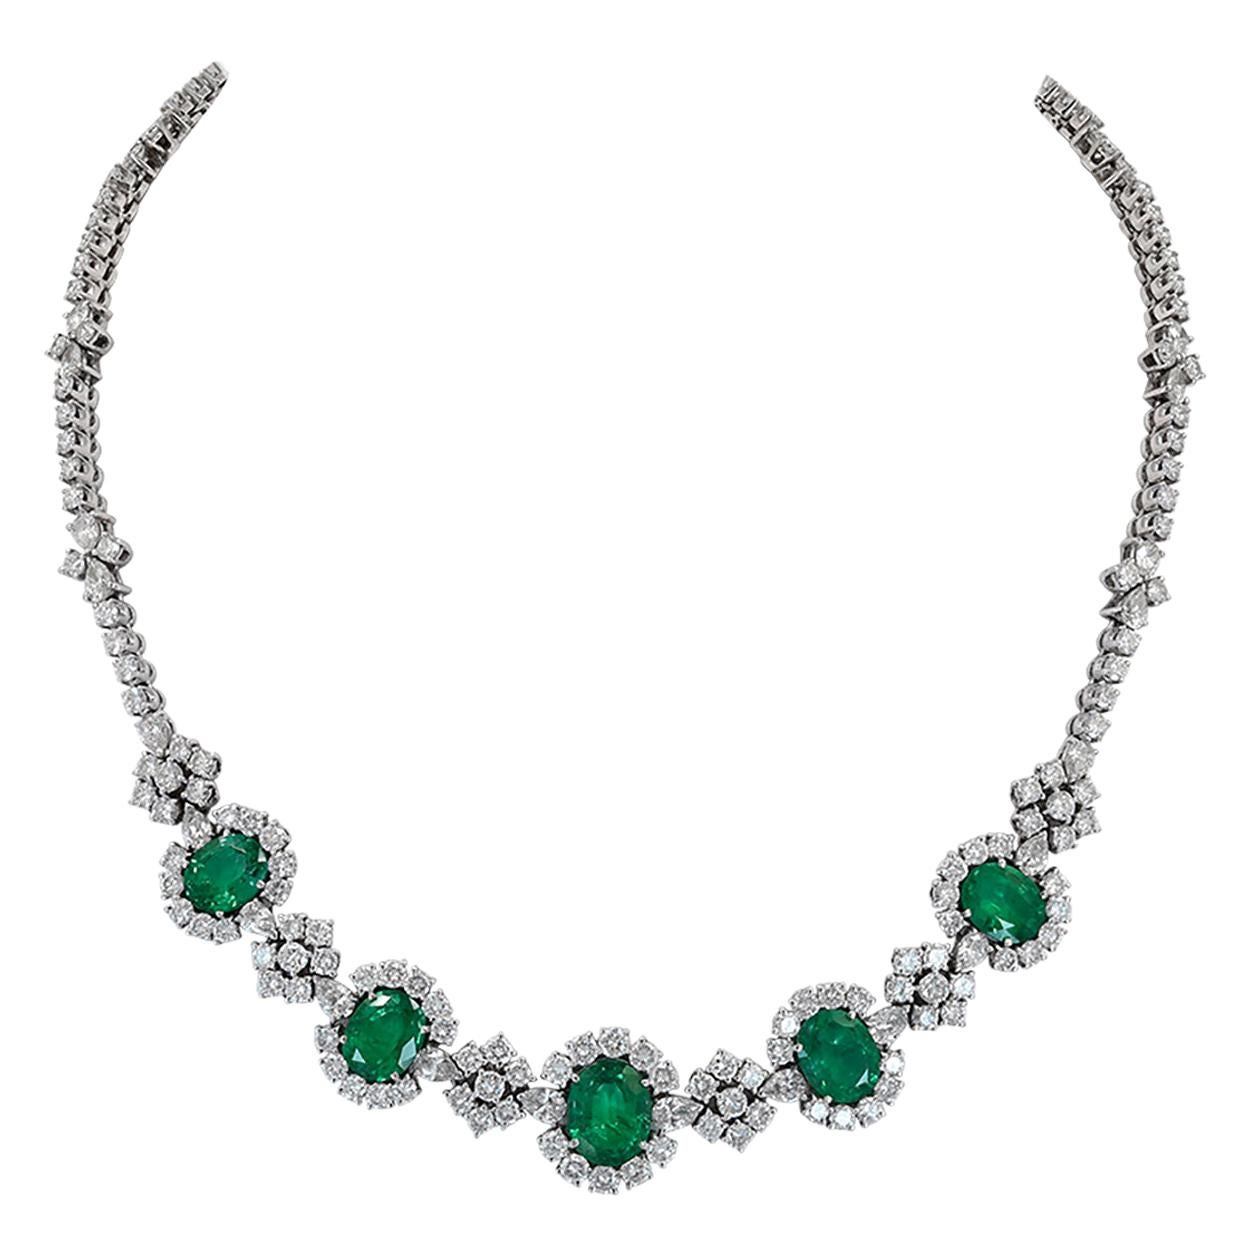 Emerald Diamond 18 Karat White Gold Necklace